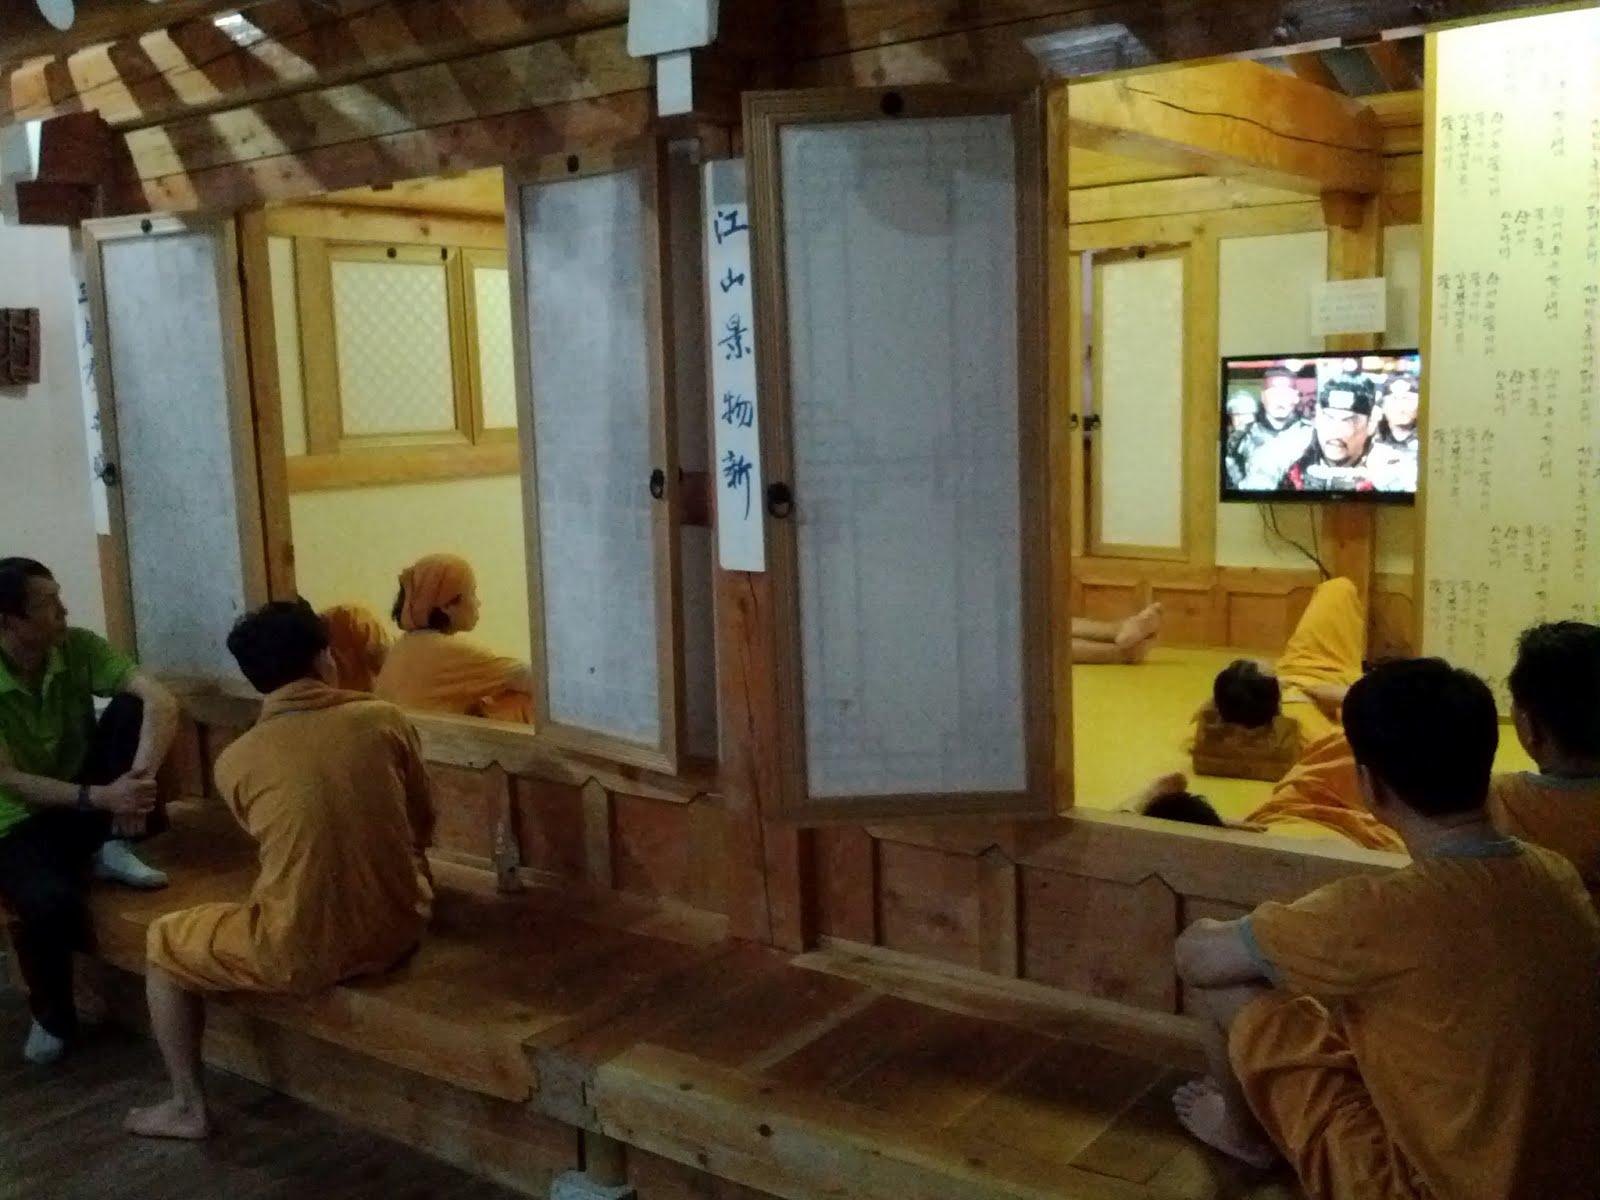 Sparkling Seoul: Korean Sauna aka Jjimjilbang